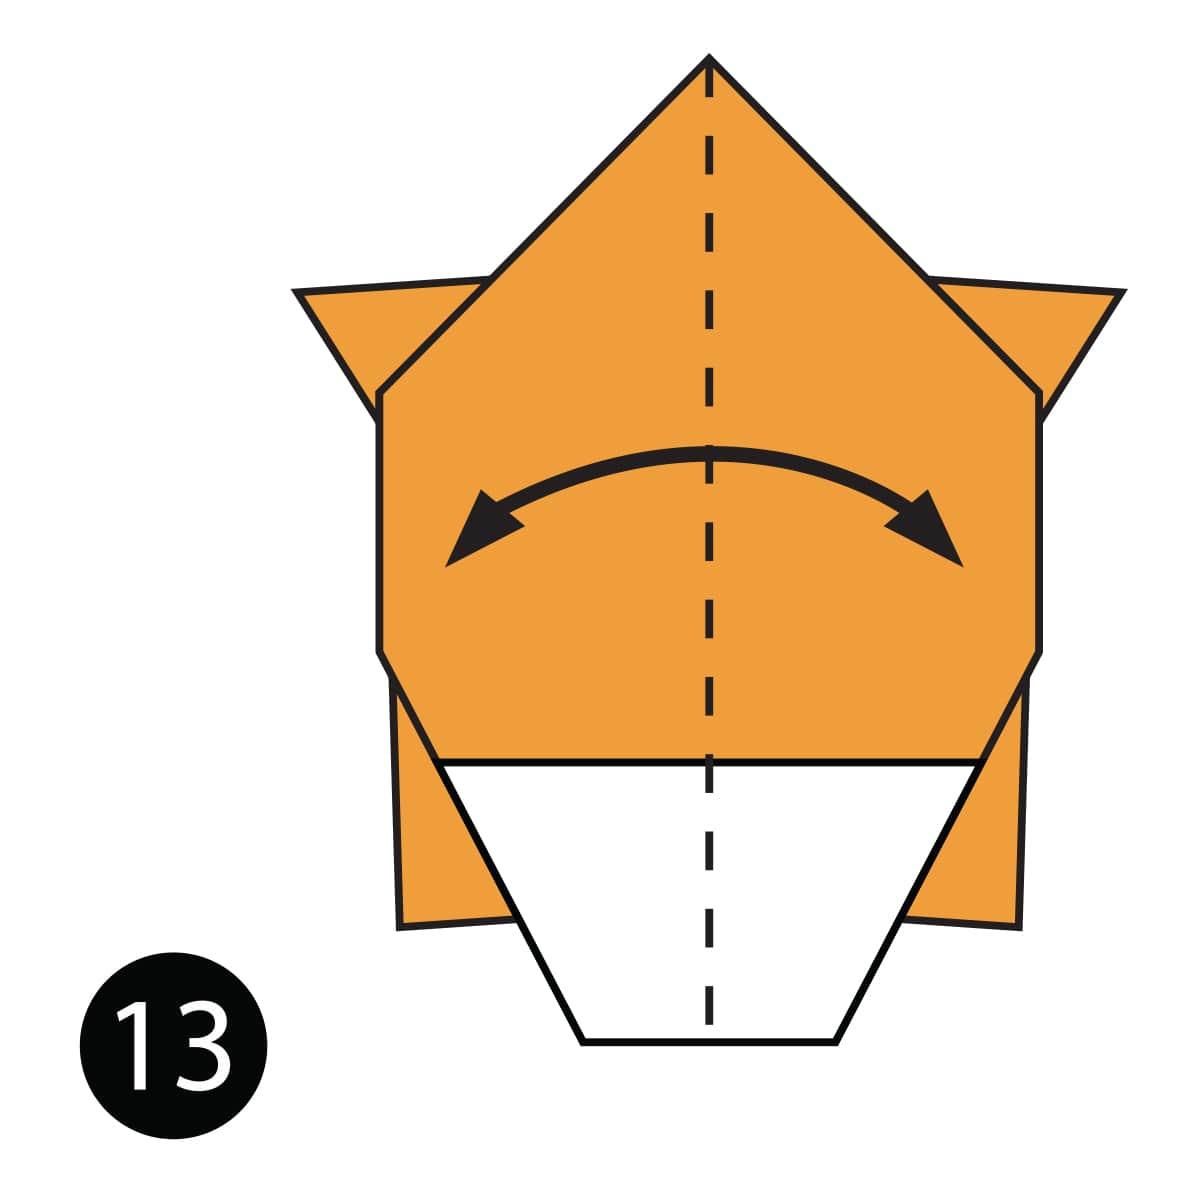 Platypus Step 13